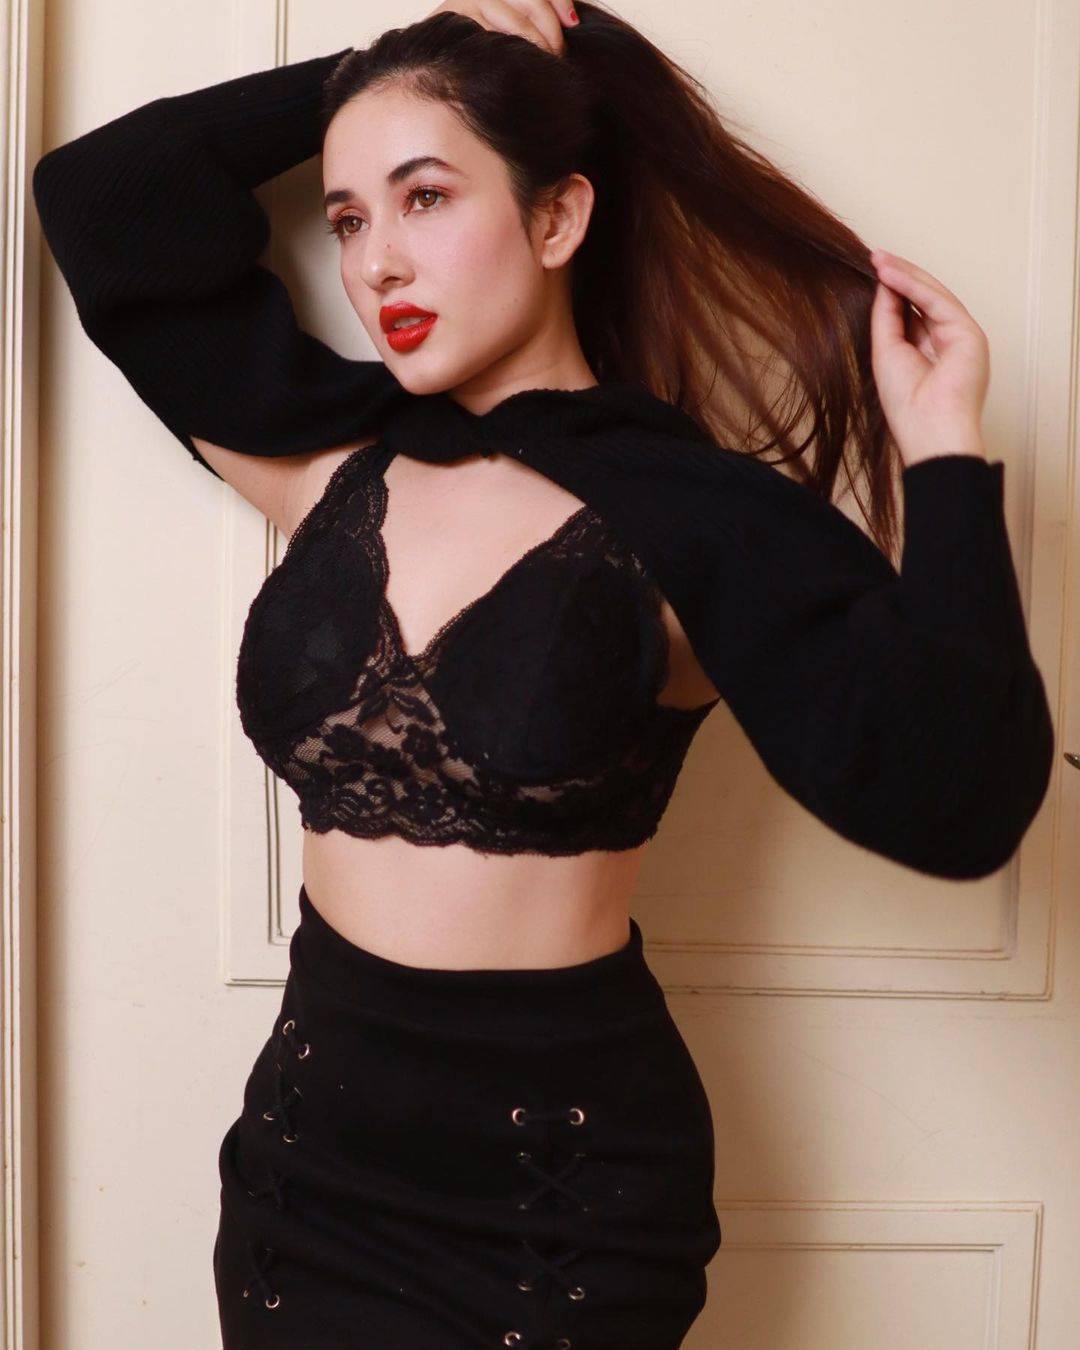 Glamorous pictures of Nepali beauty Aditi Budhathoki make heads turn